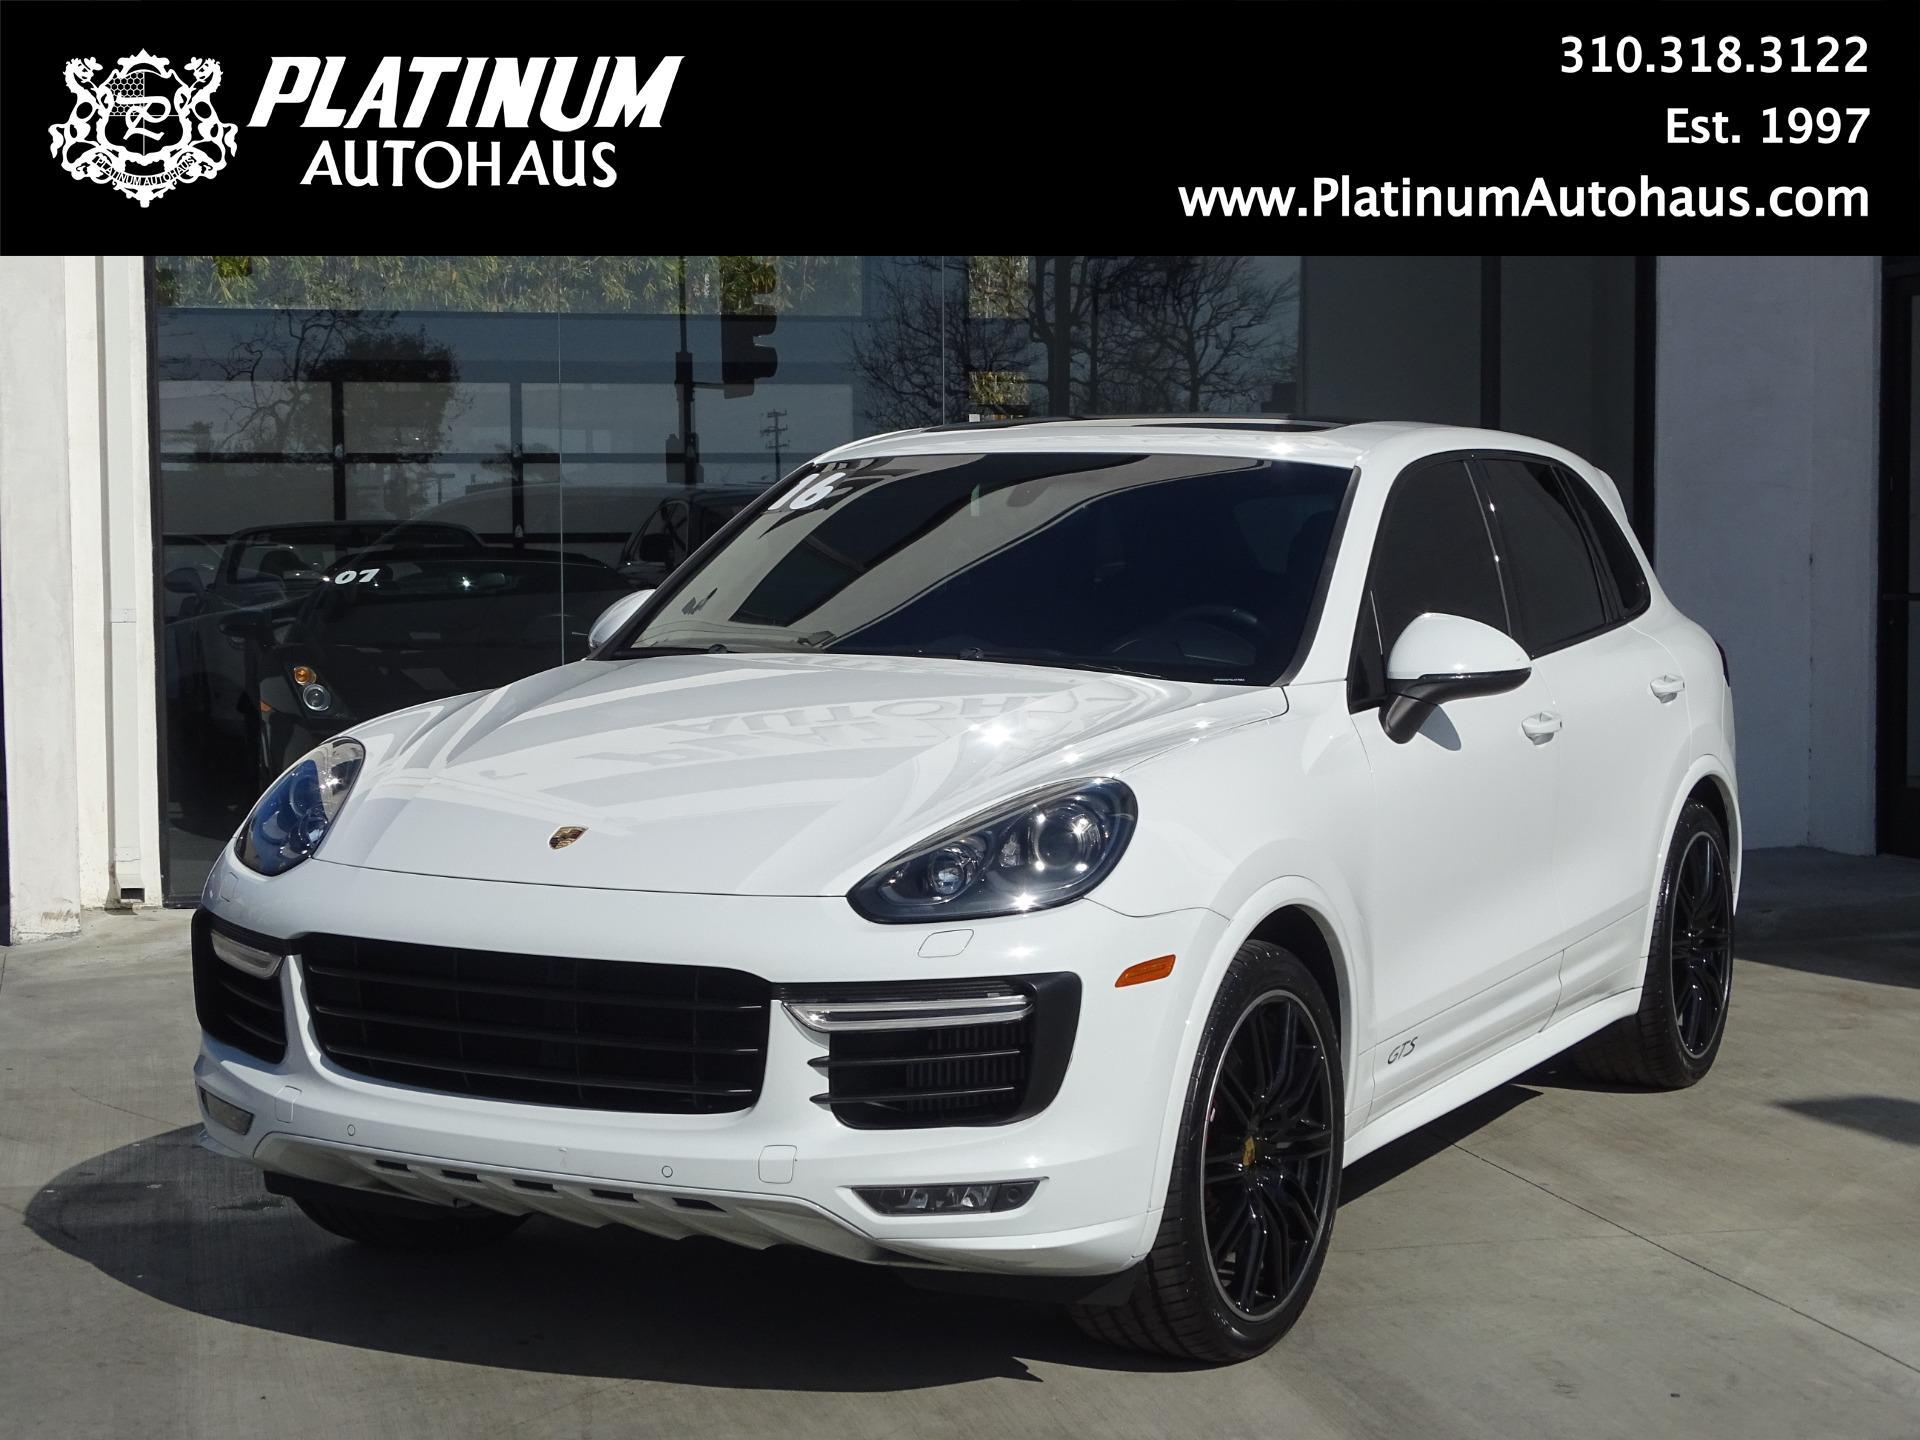 2016 Porsche Cayenne Gts Stock 6360 For Sale Near Redondo